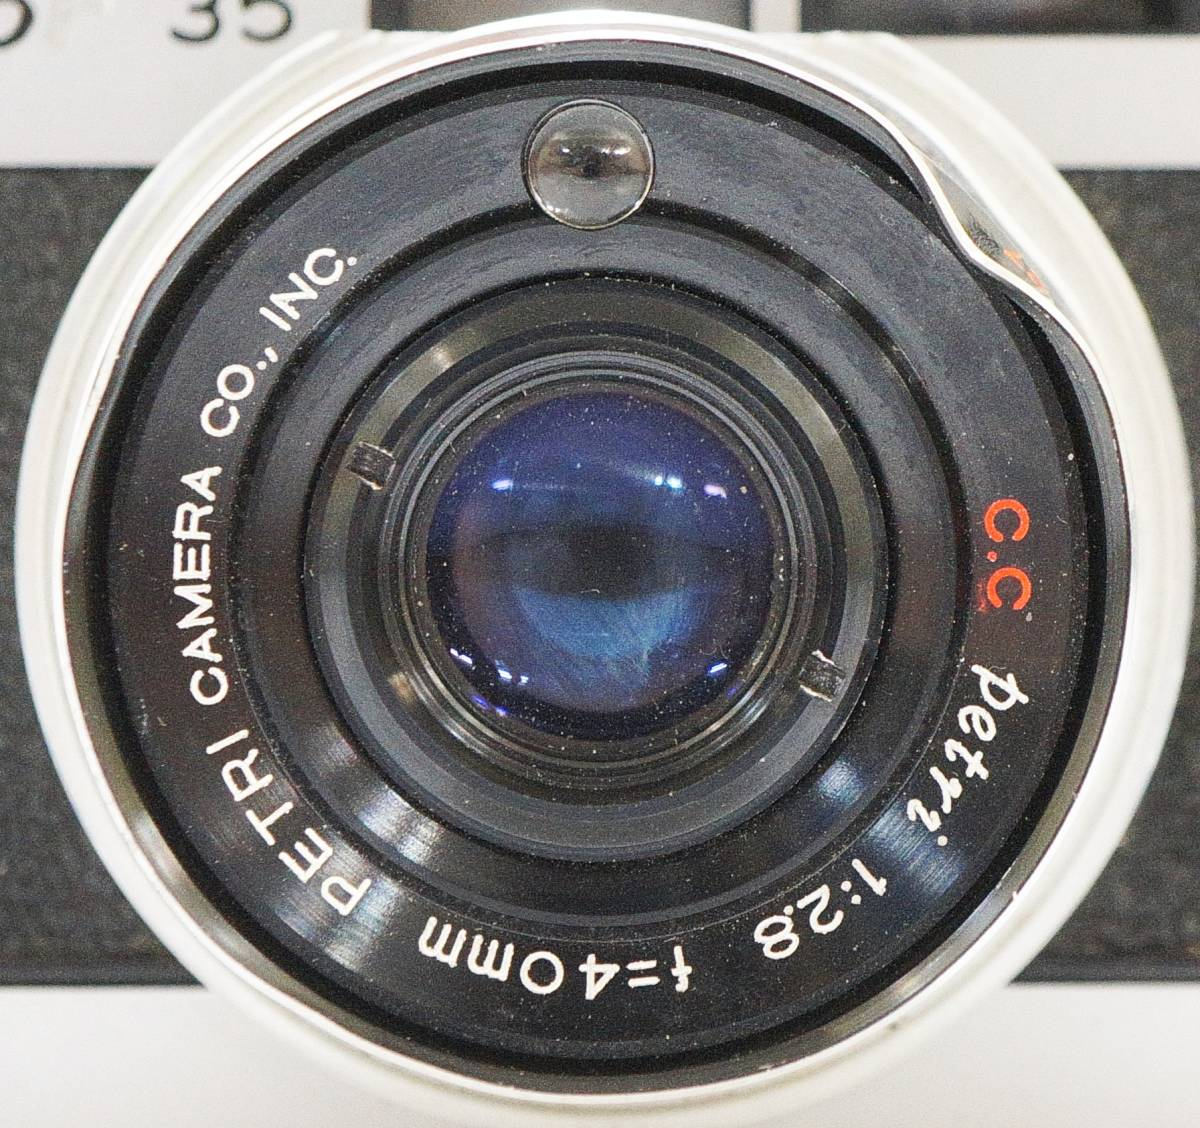 □ PETRI Color 35 ペトリ カラー35 コンパクト/フィルムカメラ Petri 1:2.8 f=40㎜ 動作未確認 訳あり 中古 現状品 ③_画像9